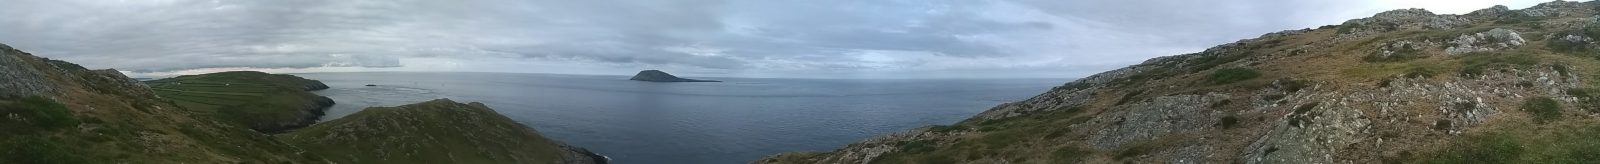 Llyn Peninsular